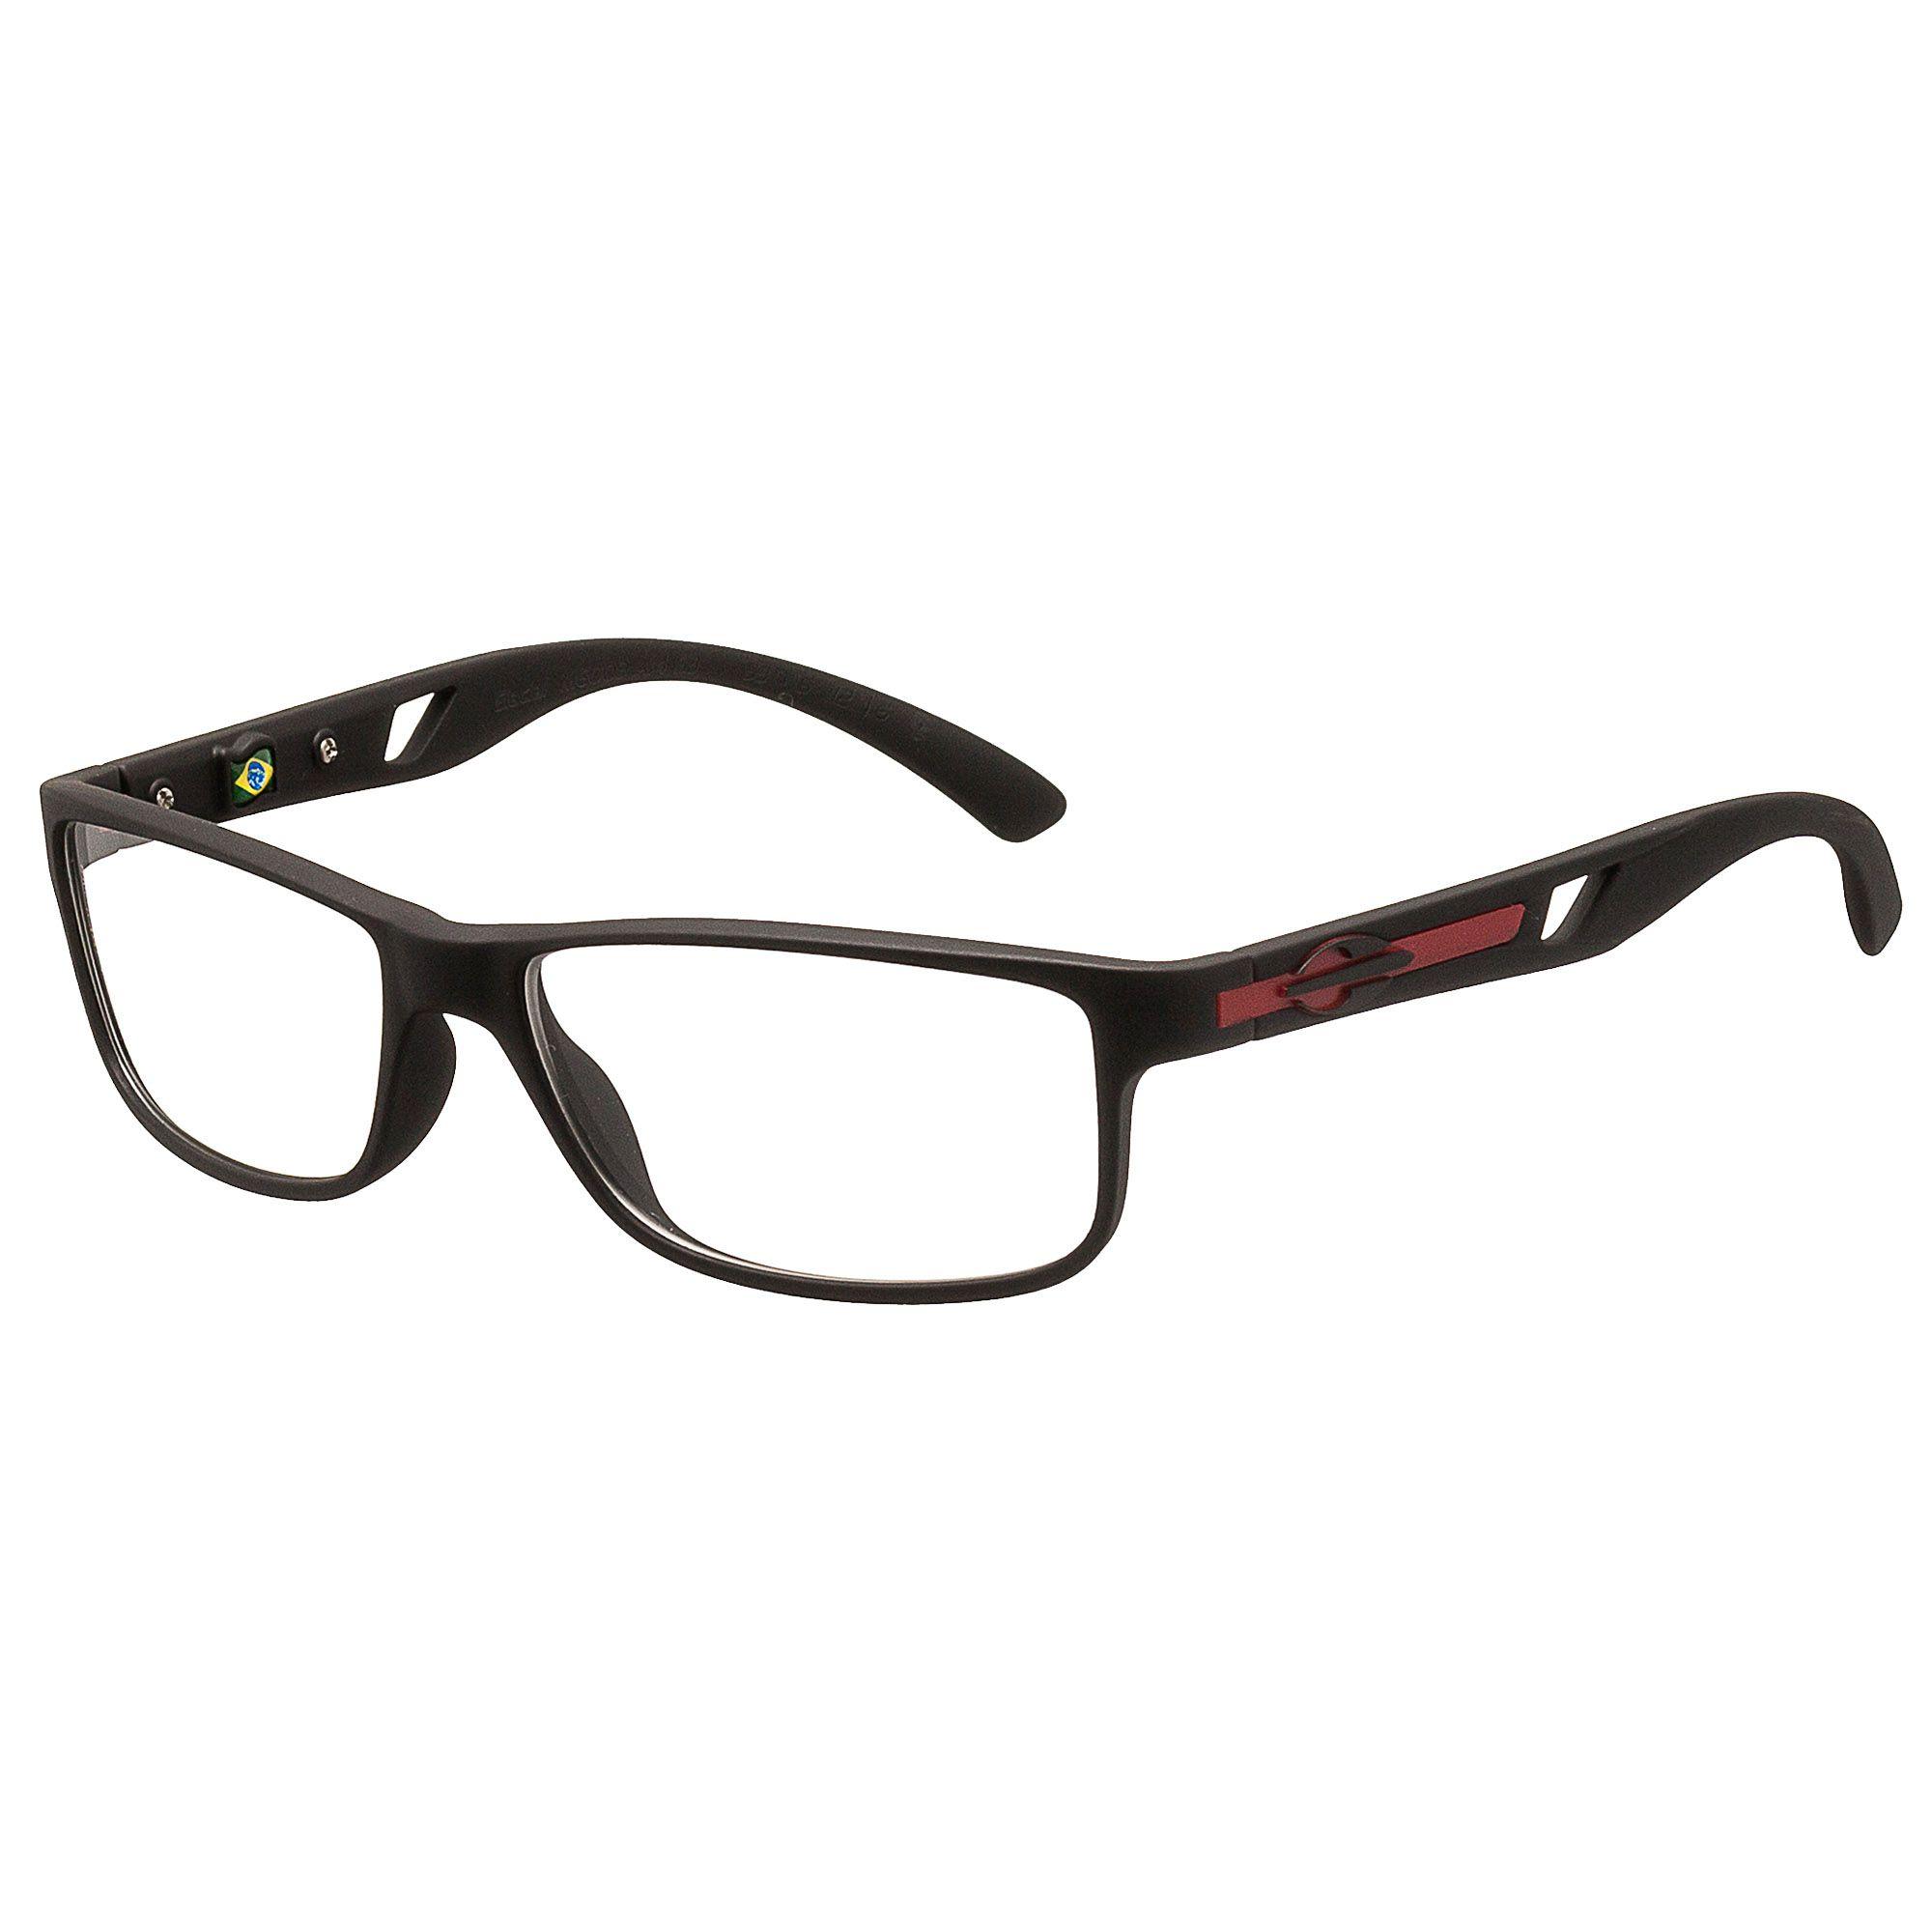 Óculos de Grau Unissex Mormaii Glacial M6009A1453